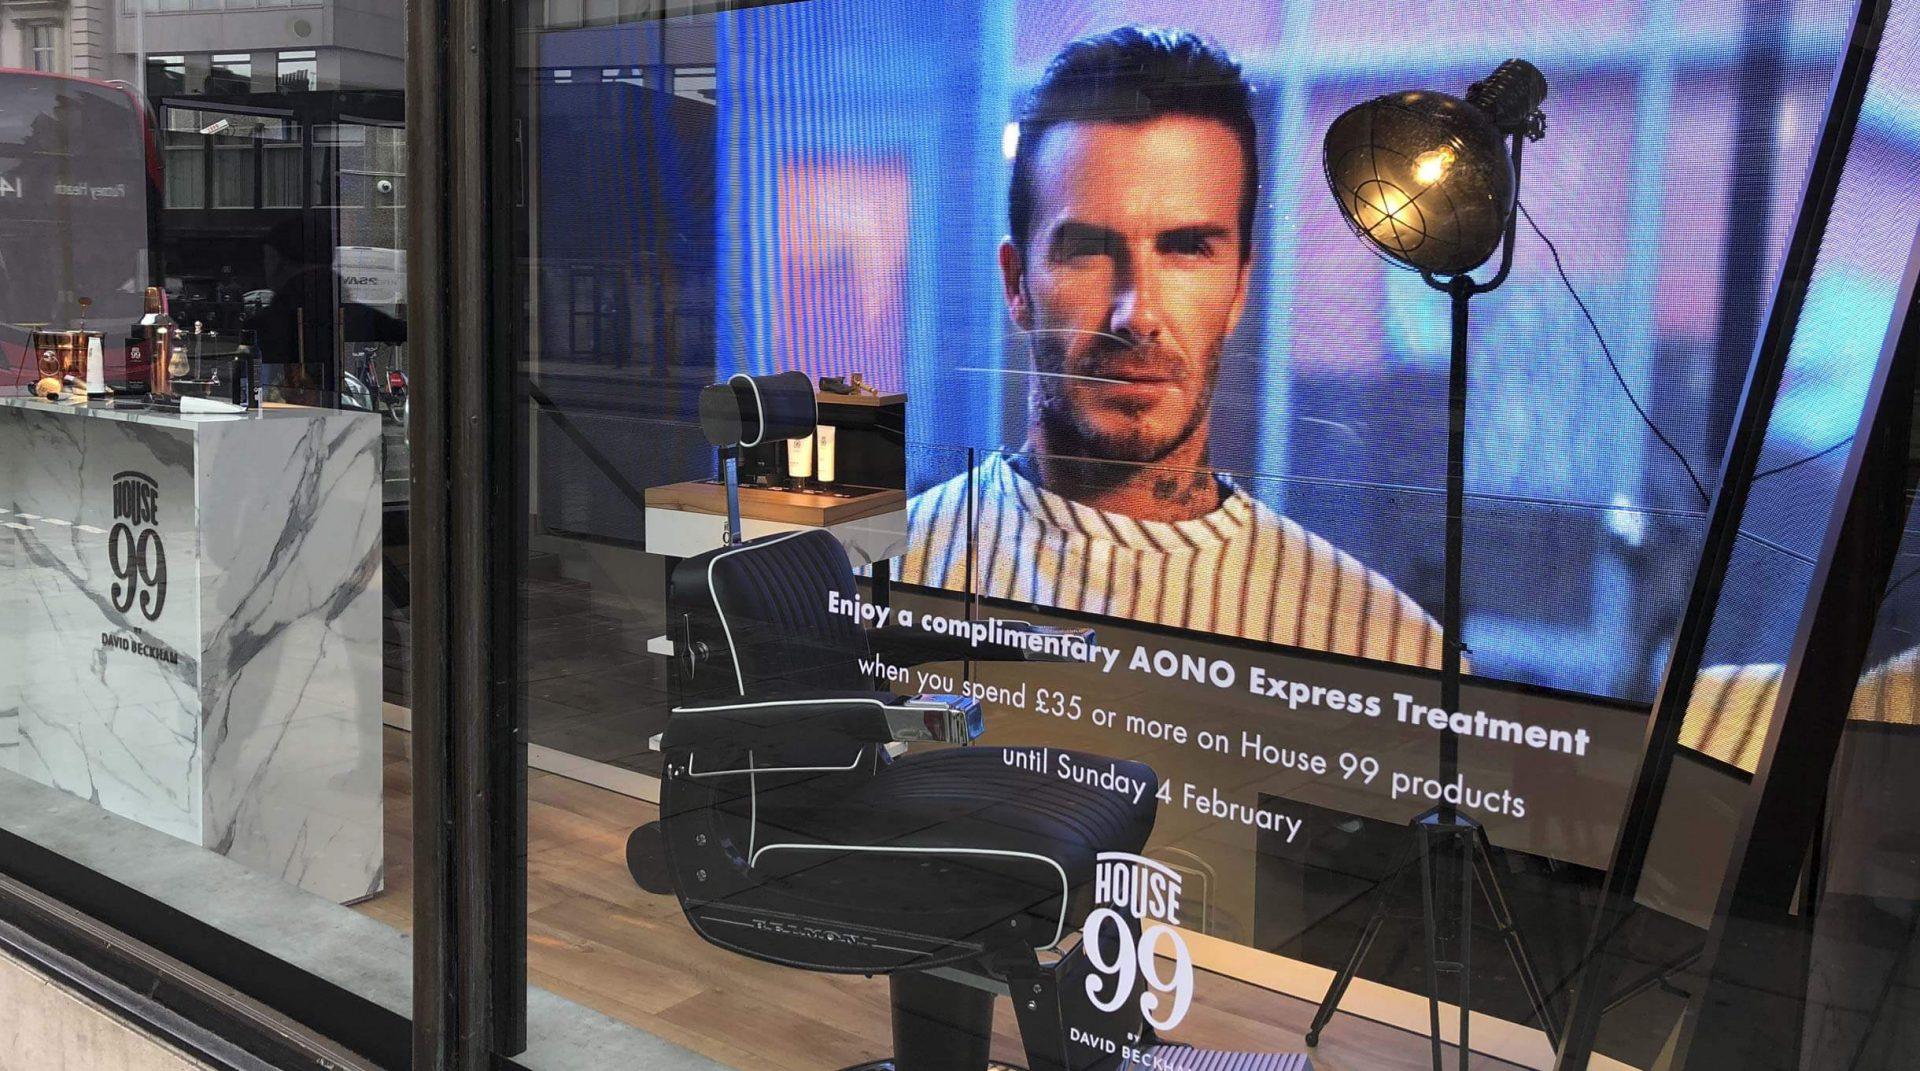 David Beckham's House 99